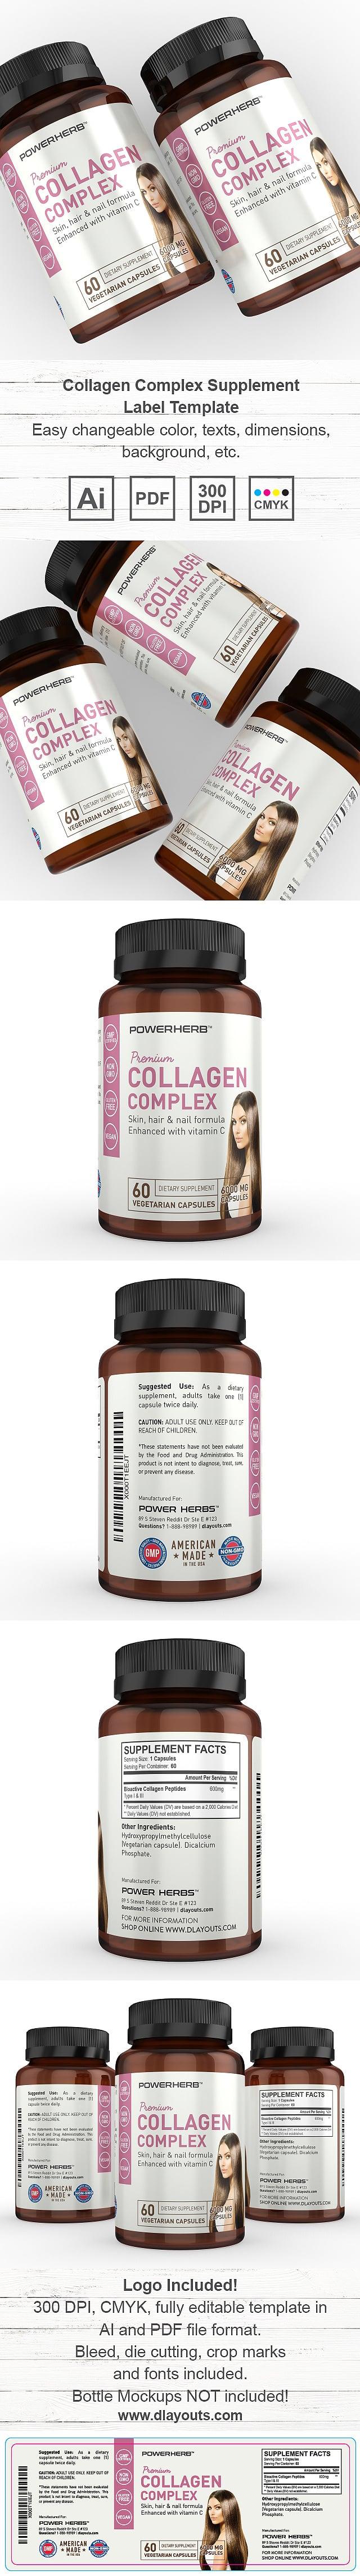 Collagen Complex Supplement Label Template